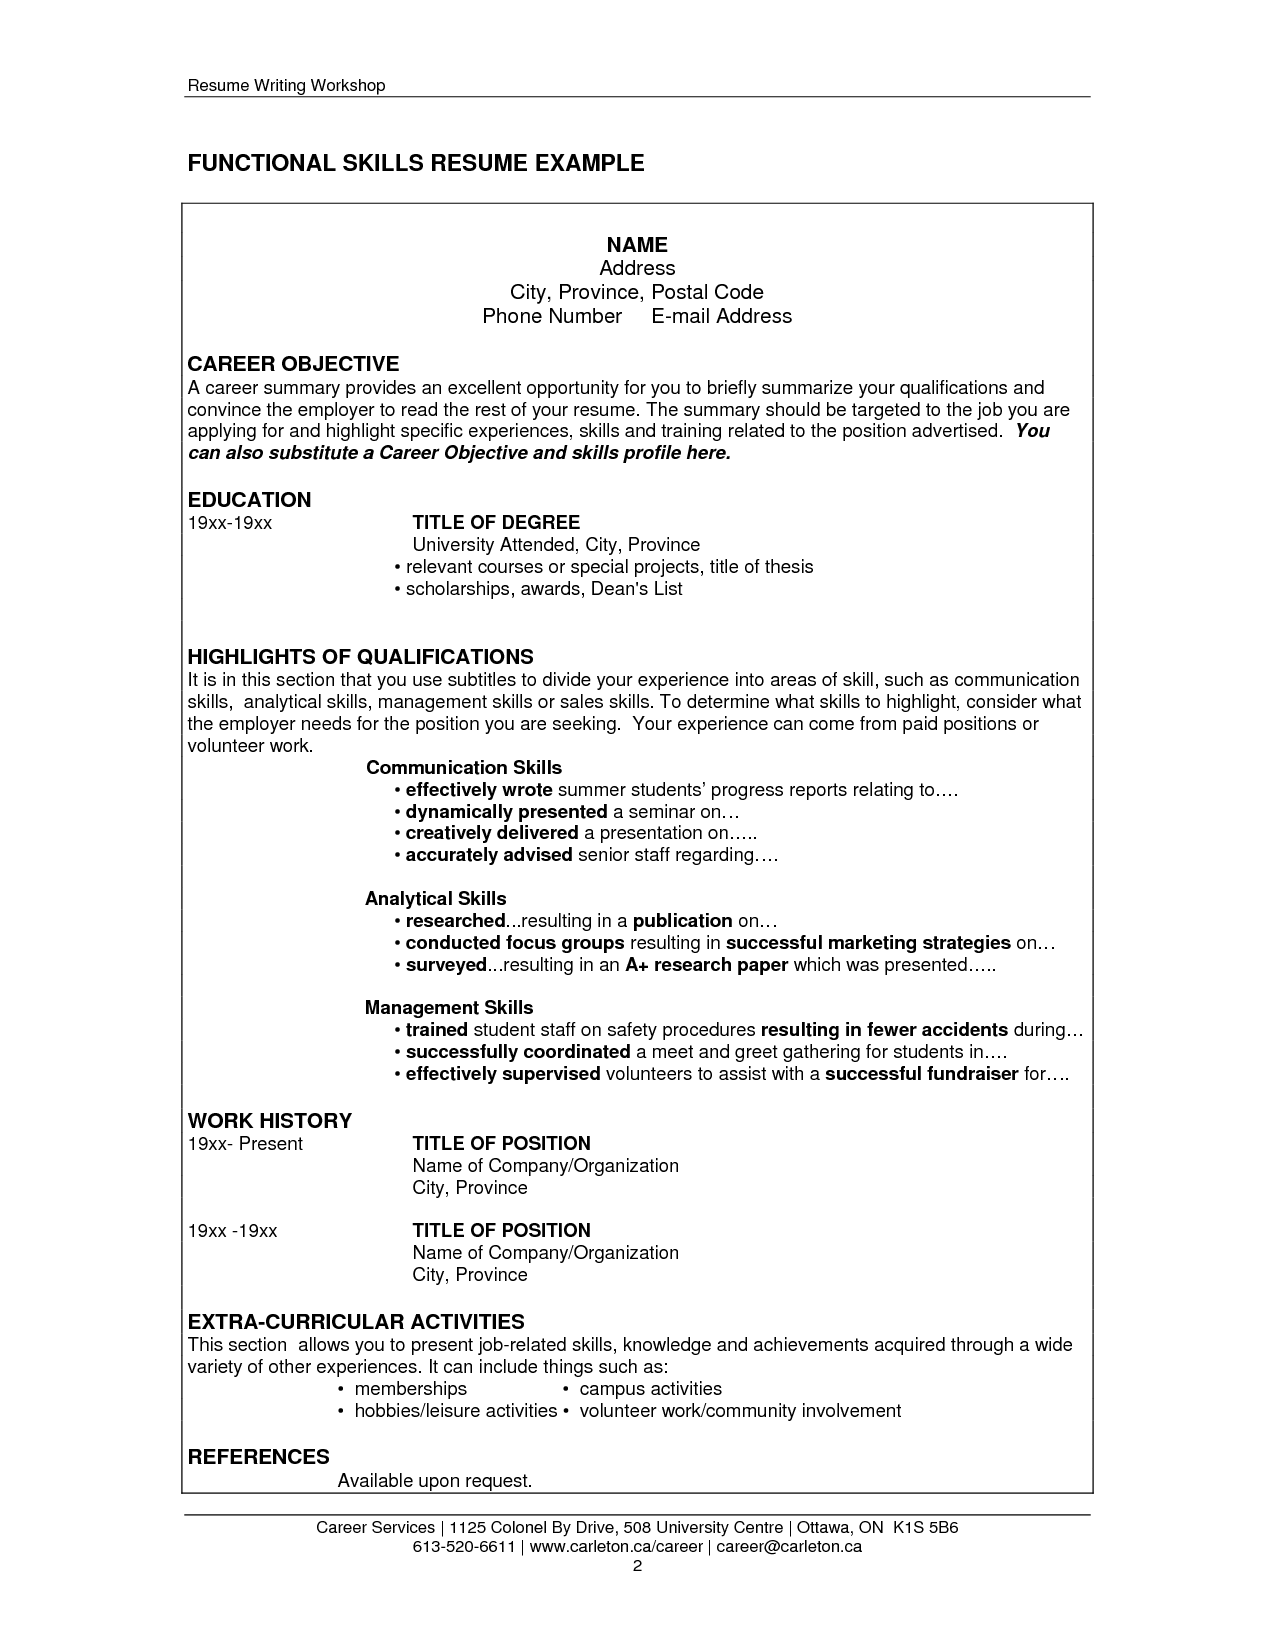 Resume Format Skills Resume Format Resume Skills Section Resume Skills Good Resume Examples